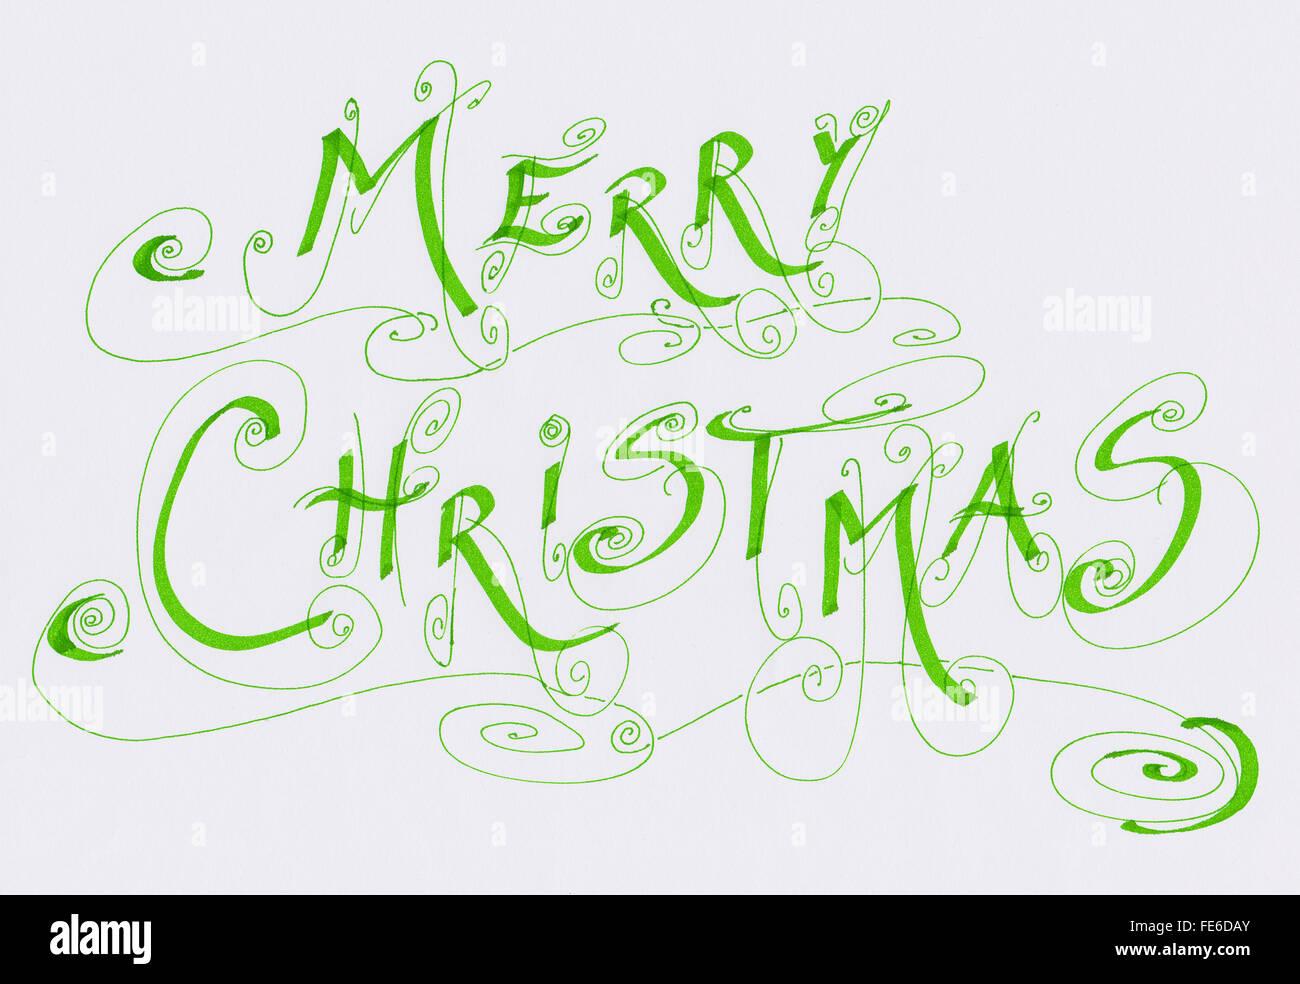 Merry Christmas Writing.Merry Christmas Calligraphic Writing Stock Photo 94799235